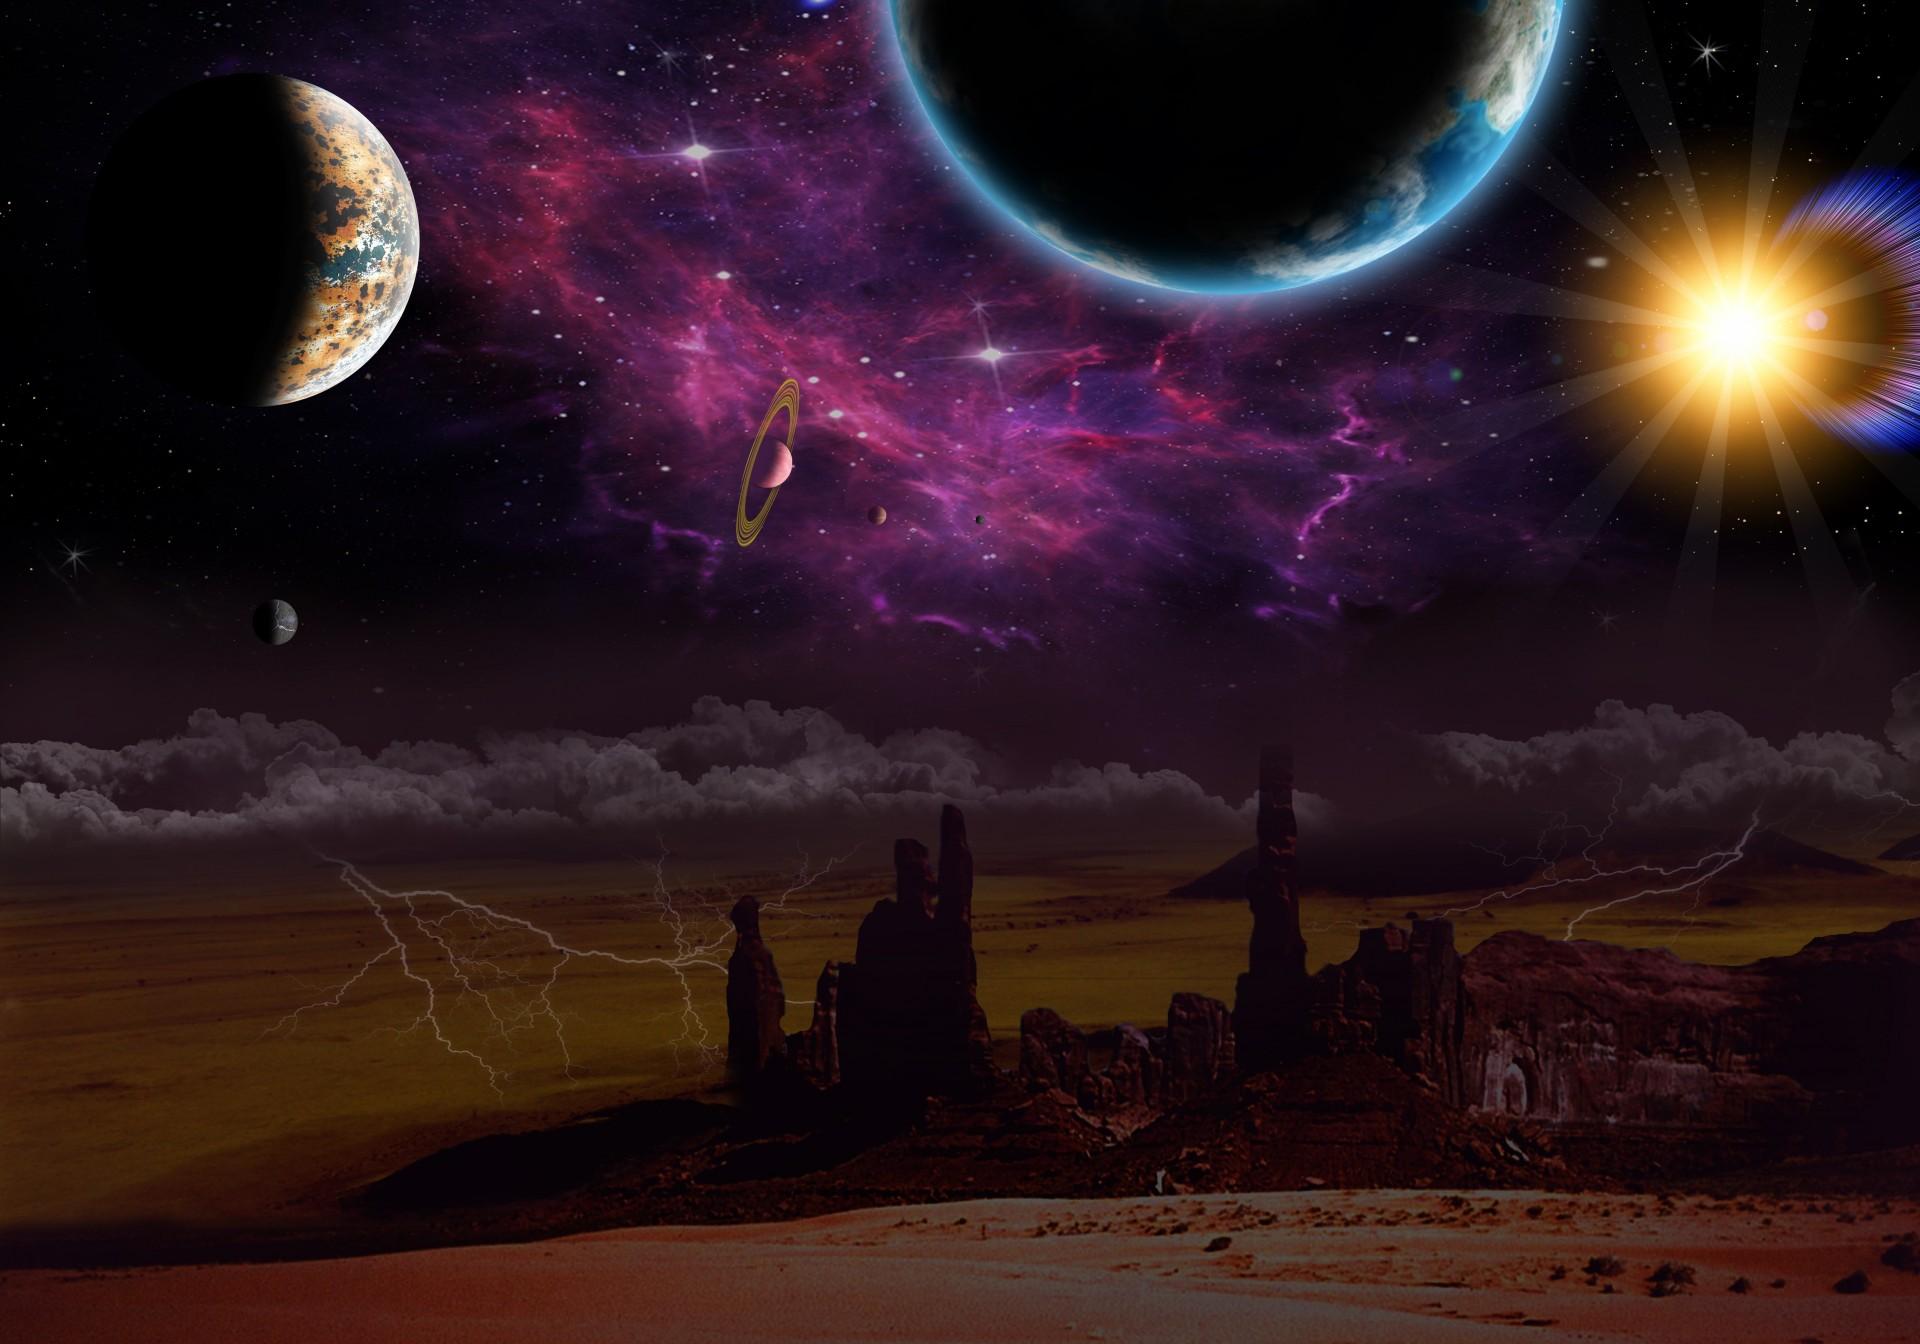 Картинки космические фантазии, челябинске квиллинг открытка